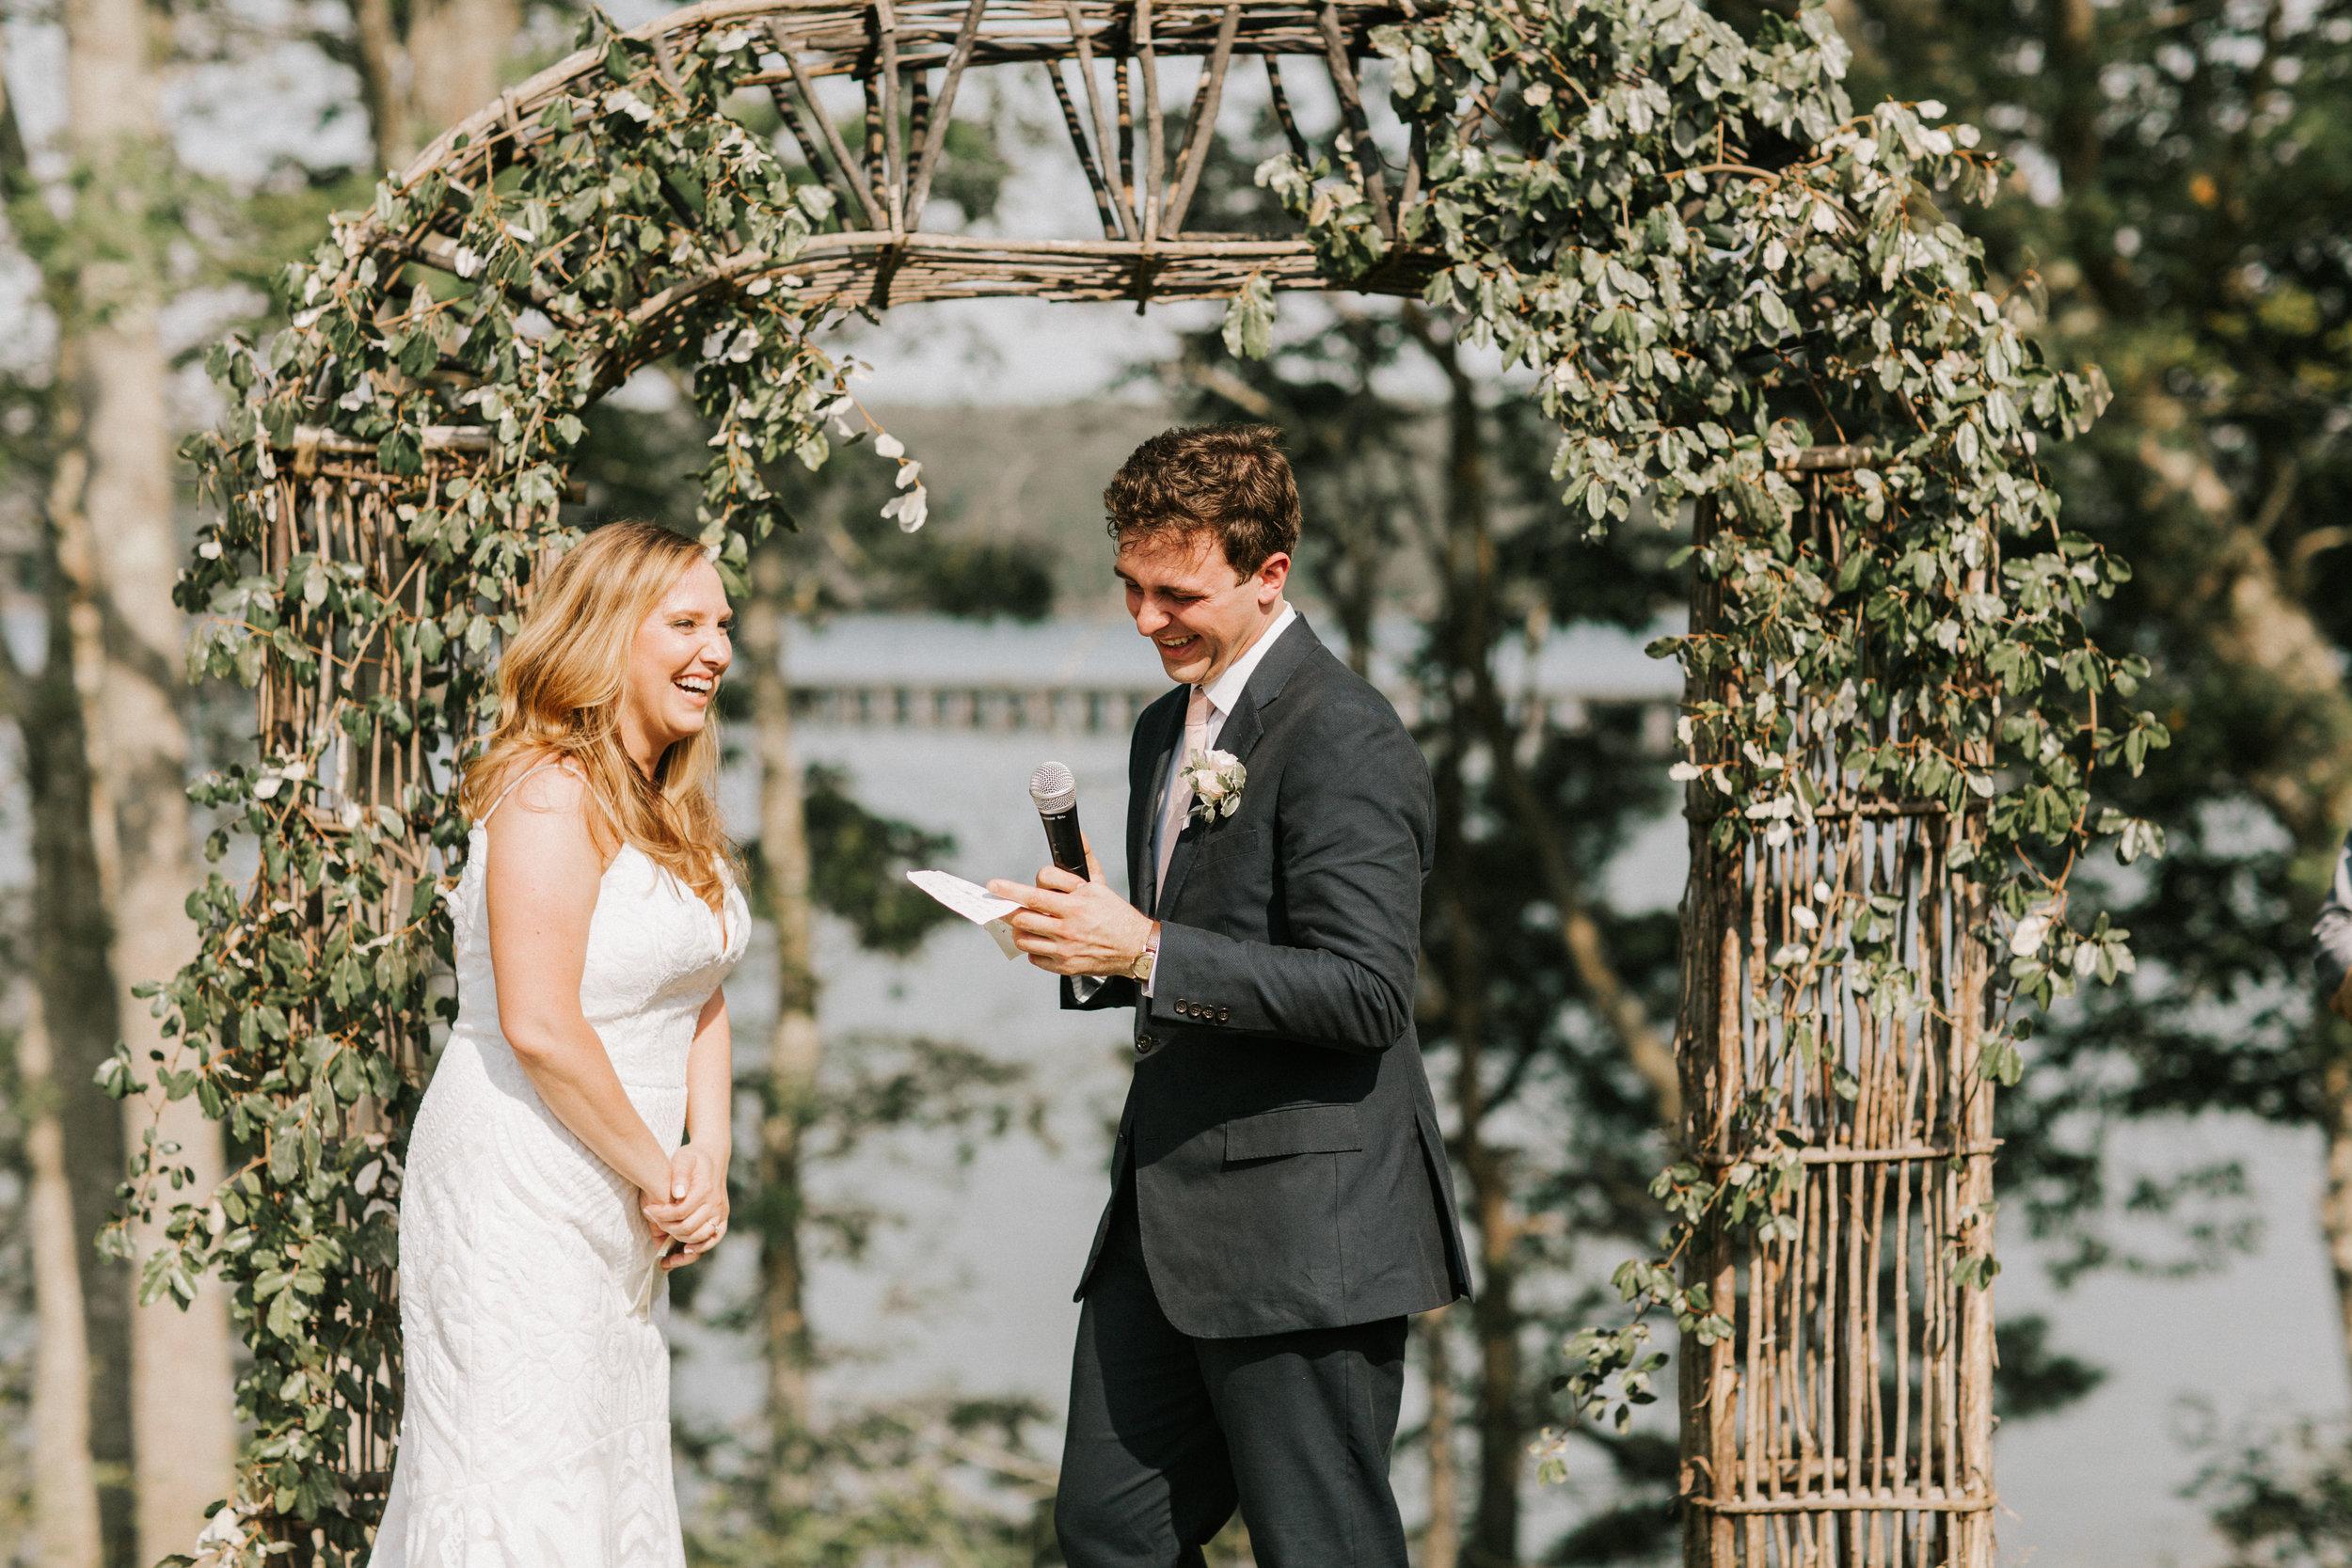 Watershed_Floral_Marianmade_Farm_Wedding_JamieMercurioPhoto2018-300.jpg